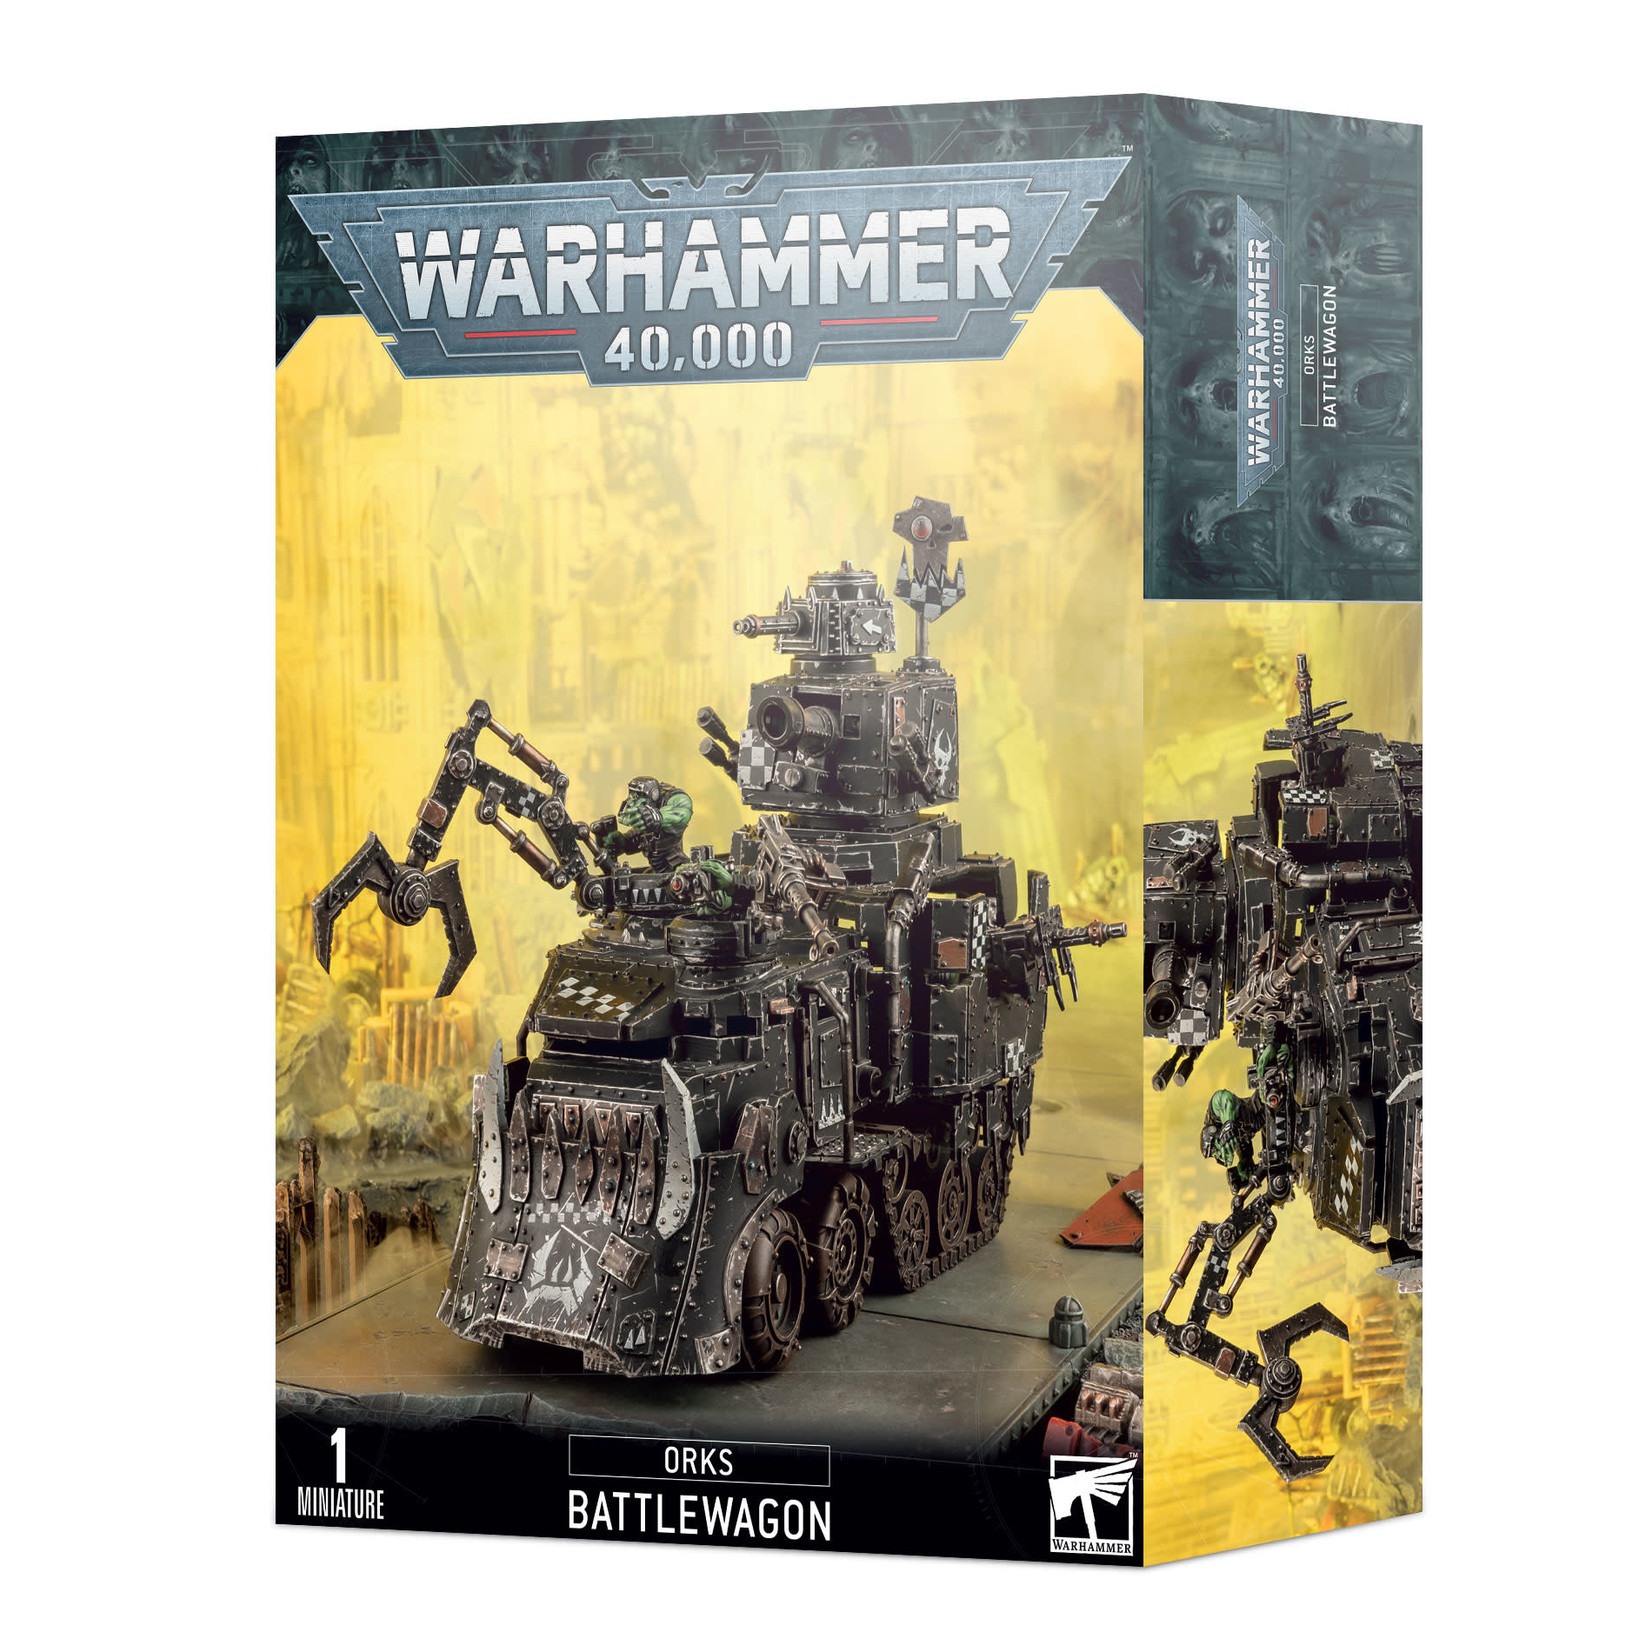 Warhammer 40K Orks - Battlewagon